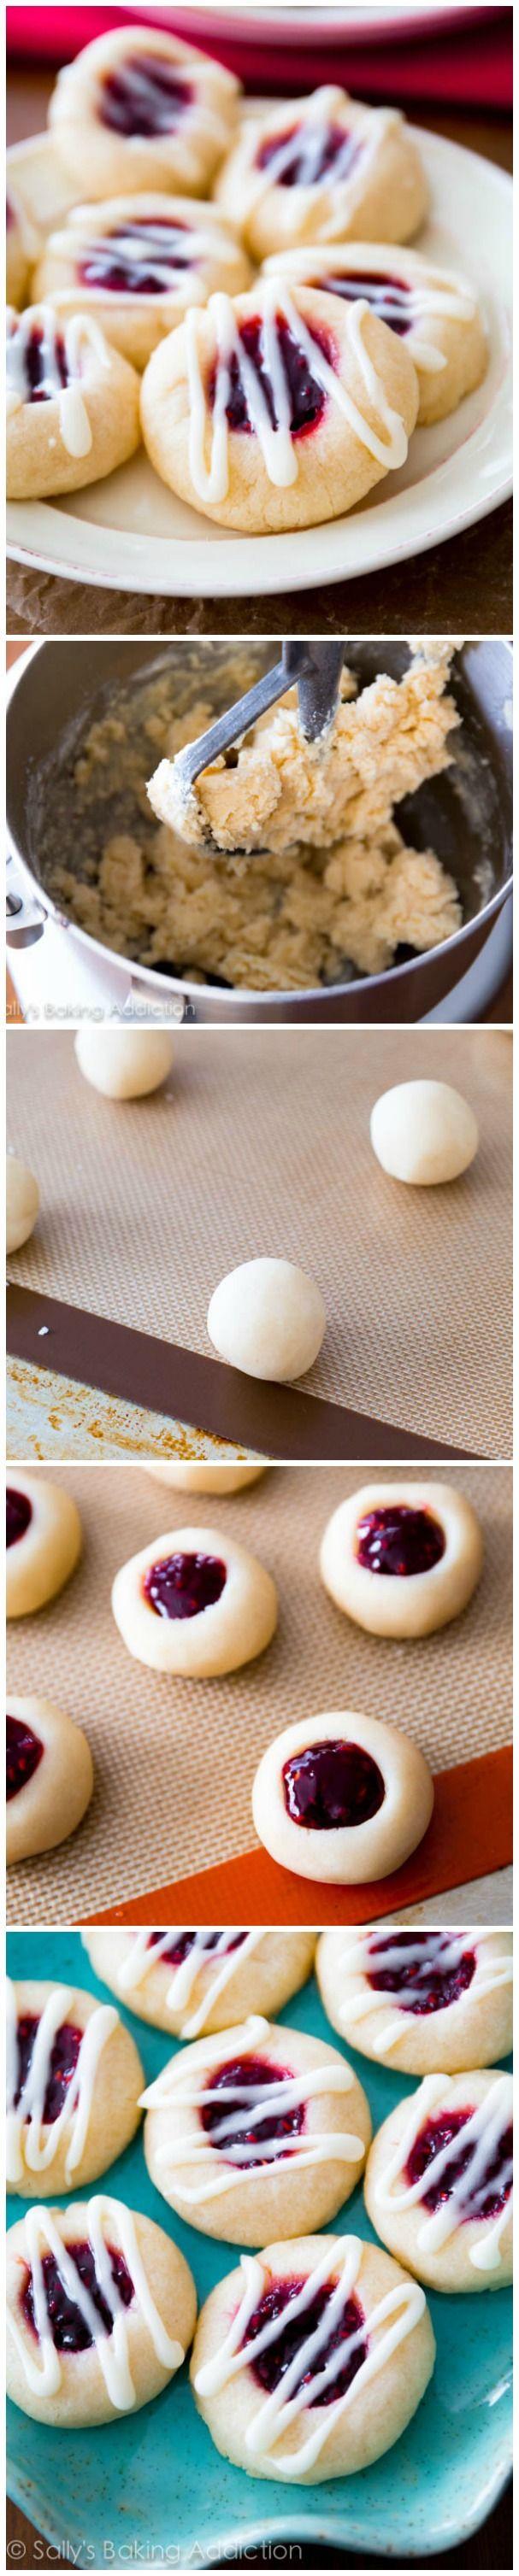 Almond Thumbprint Cookies  Raspberry Almond Thumbprint Cookies Sallys Baking Addiction